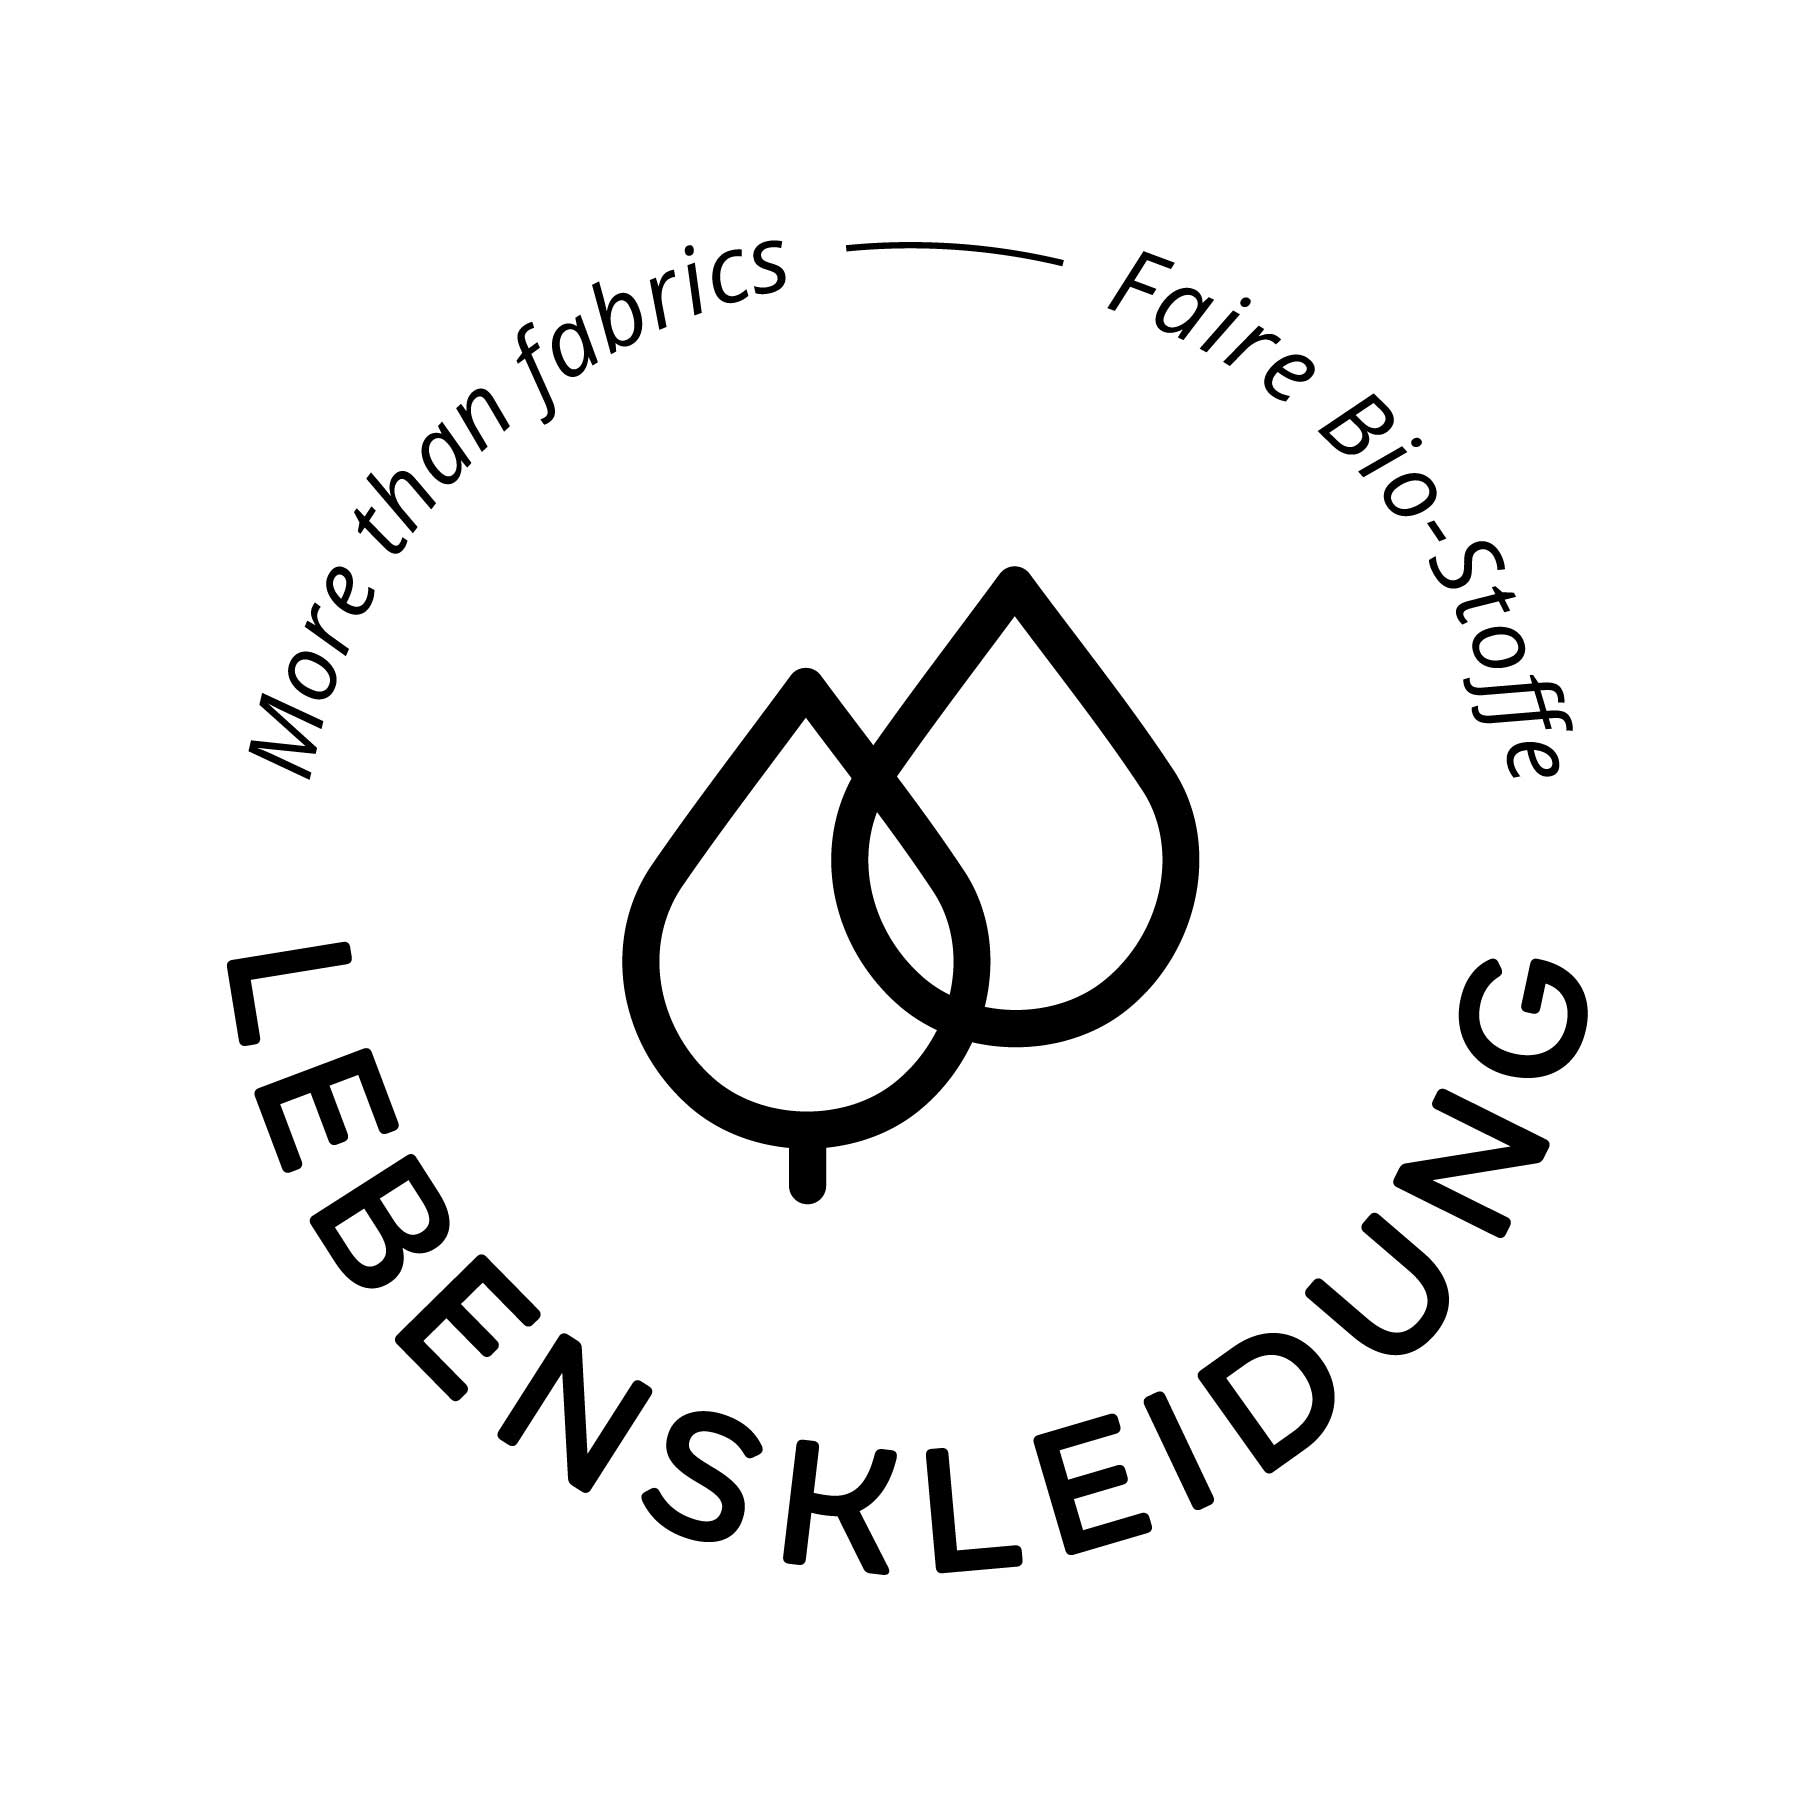 Cuffs fabric Organic  - Canary